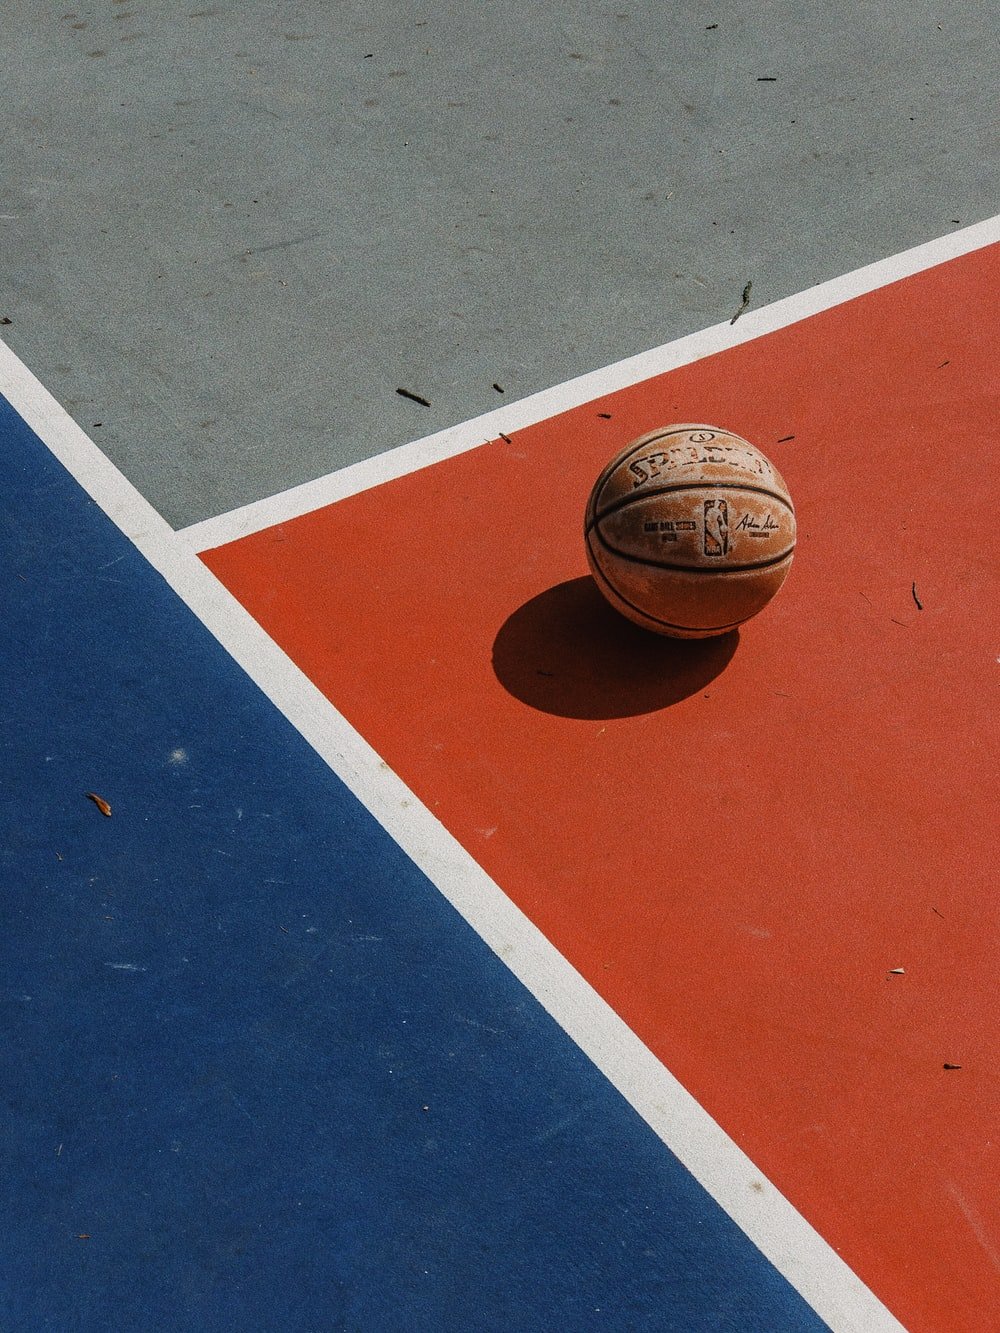 brown Spalding basketball